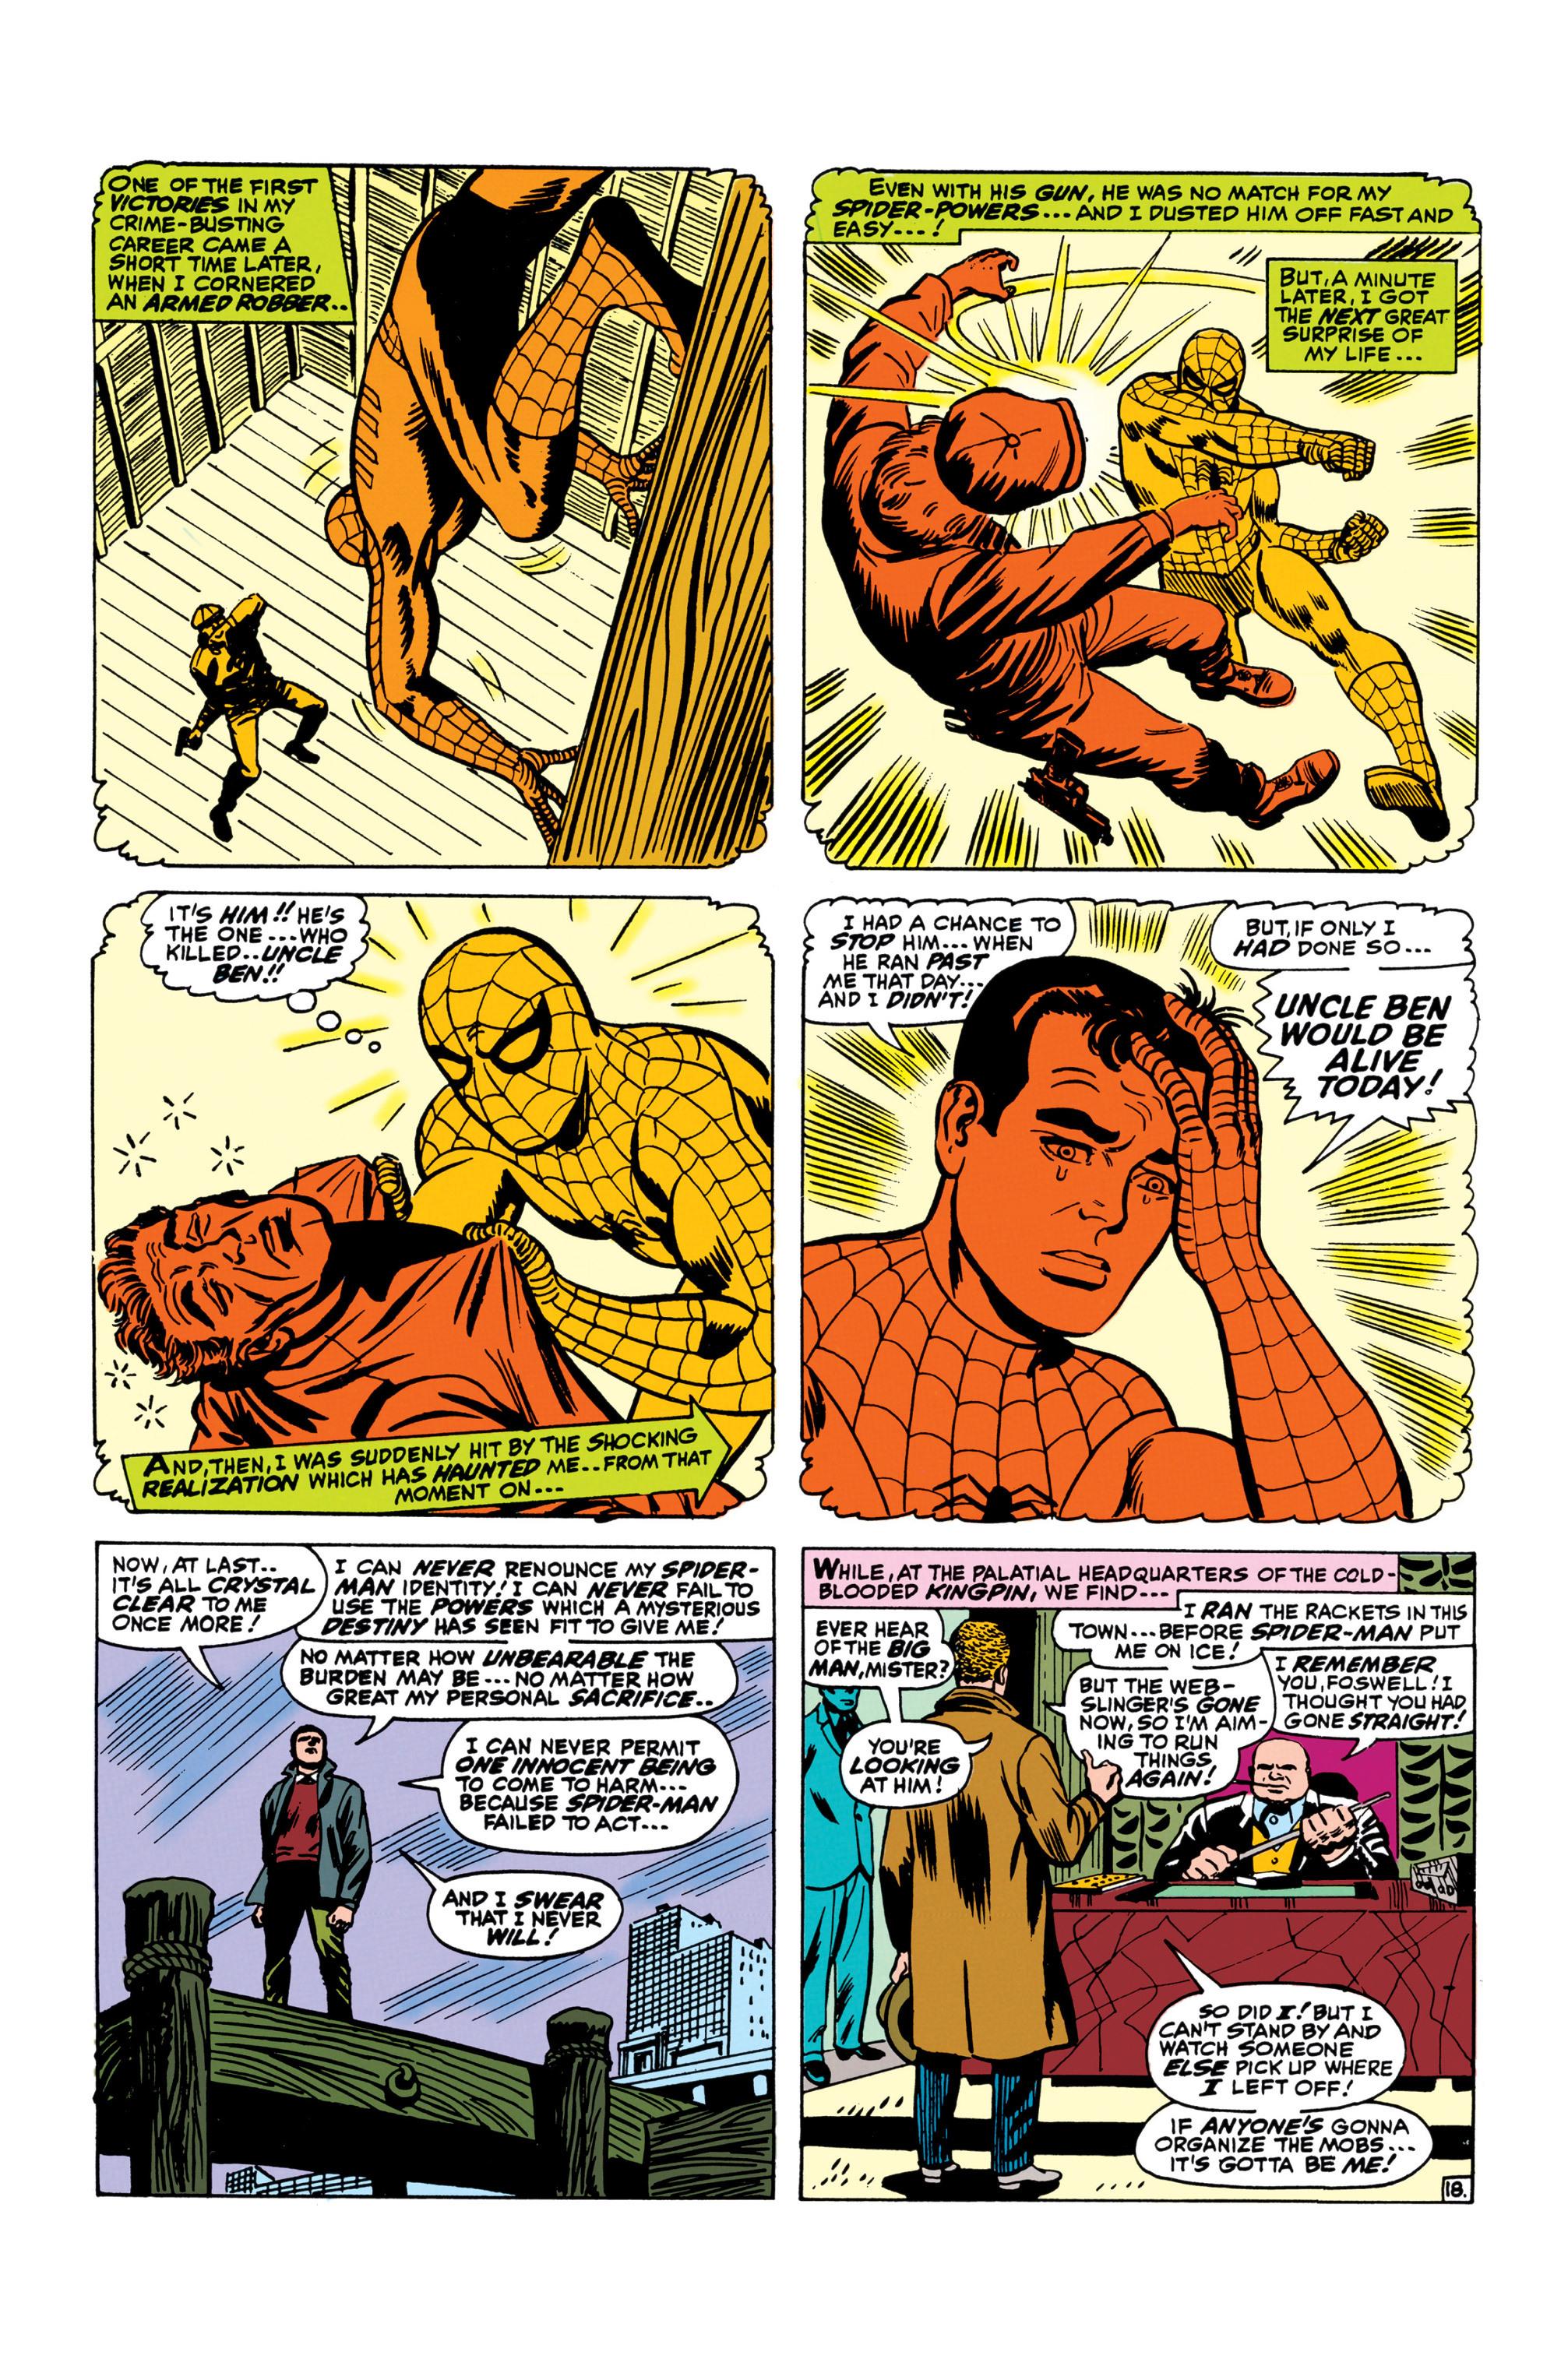 Spider-Man Character Study ― The Ultimate Essay UTkh37ngUXphGf5o83ODbPl_mb8PQLWfqmB5AClTinAh0juwebiC5xMhOwtL2RBFk9fm7oewNaCW=s0